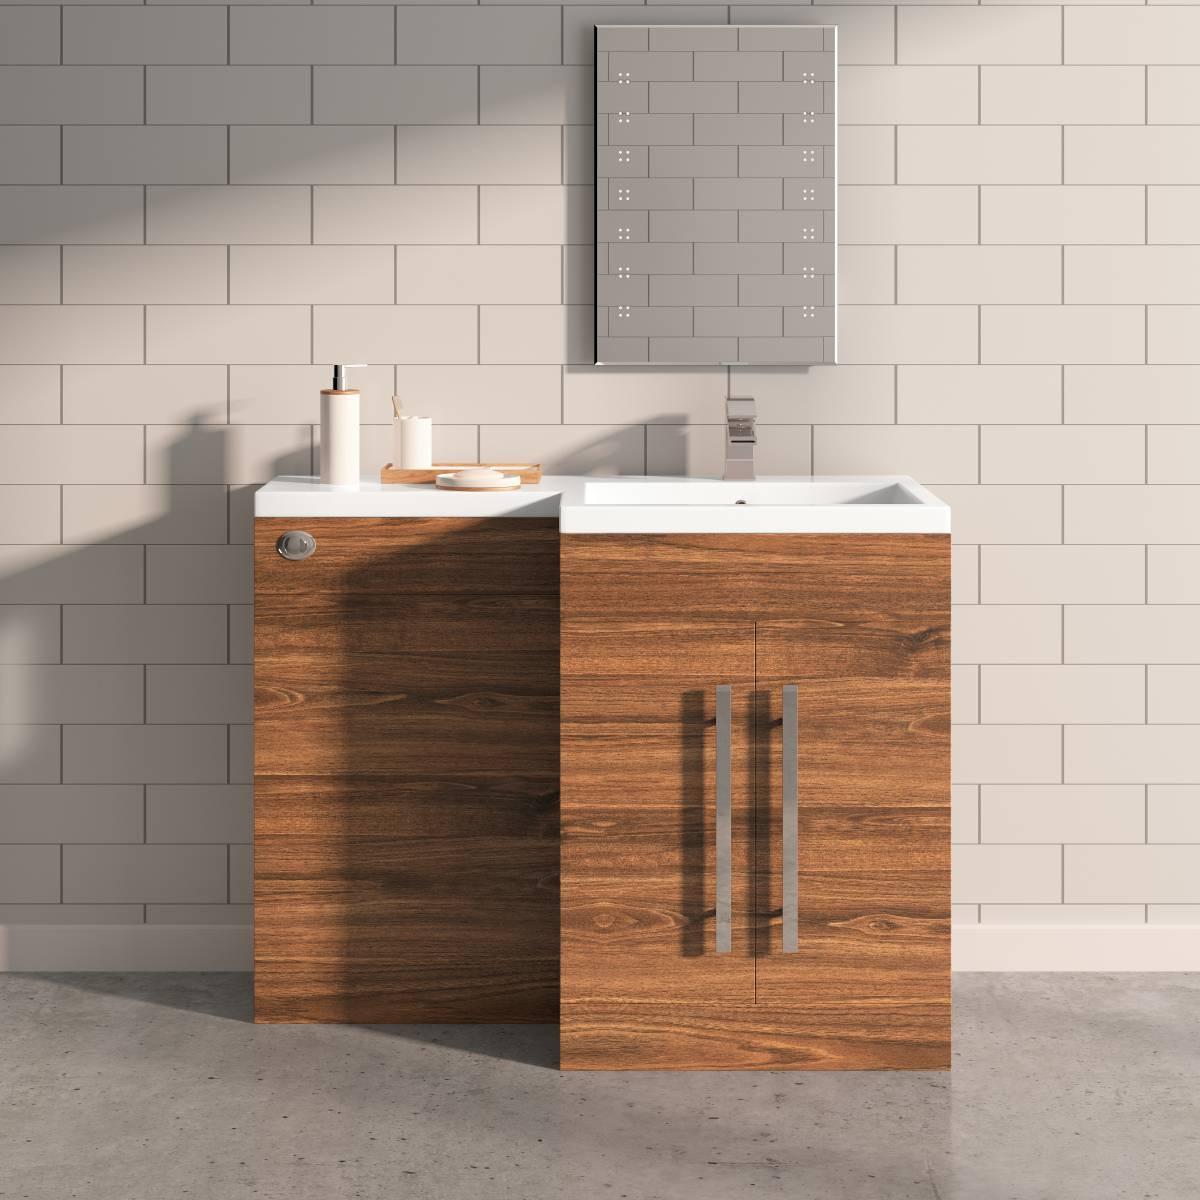 Walnut sink unit porter cable heat gun lowes